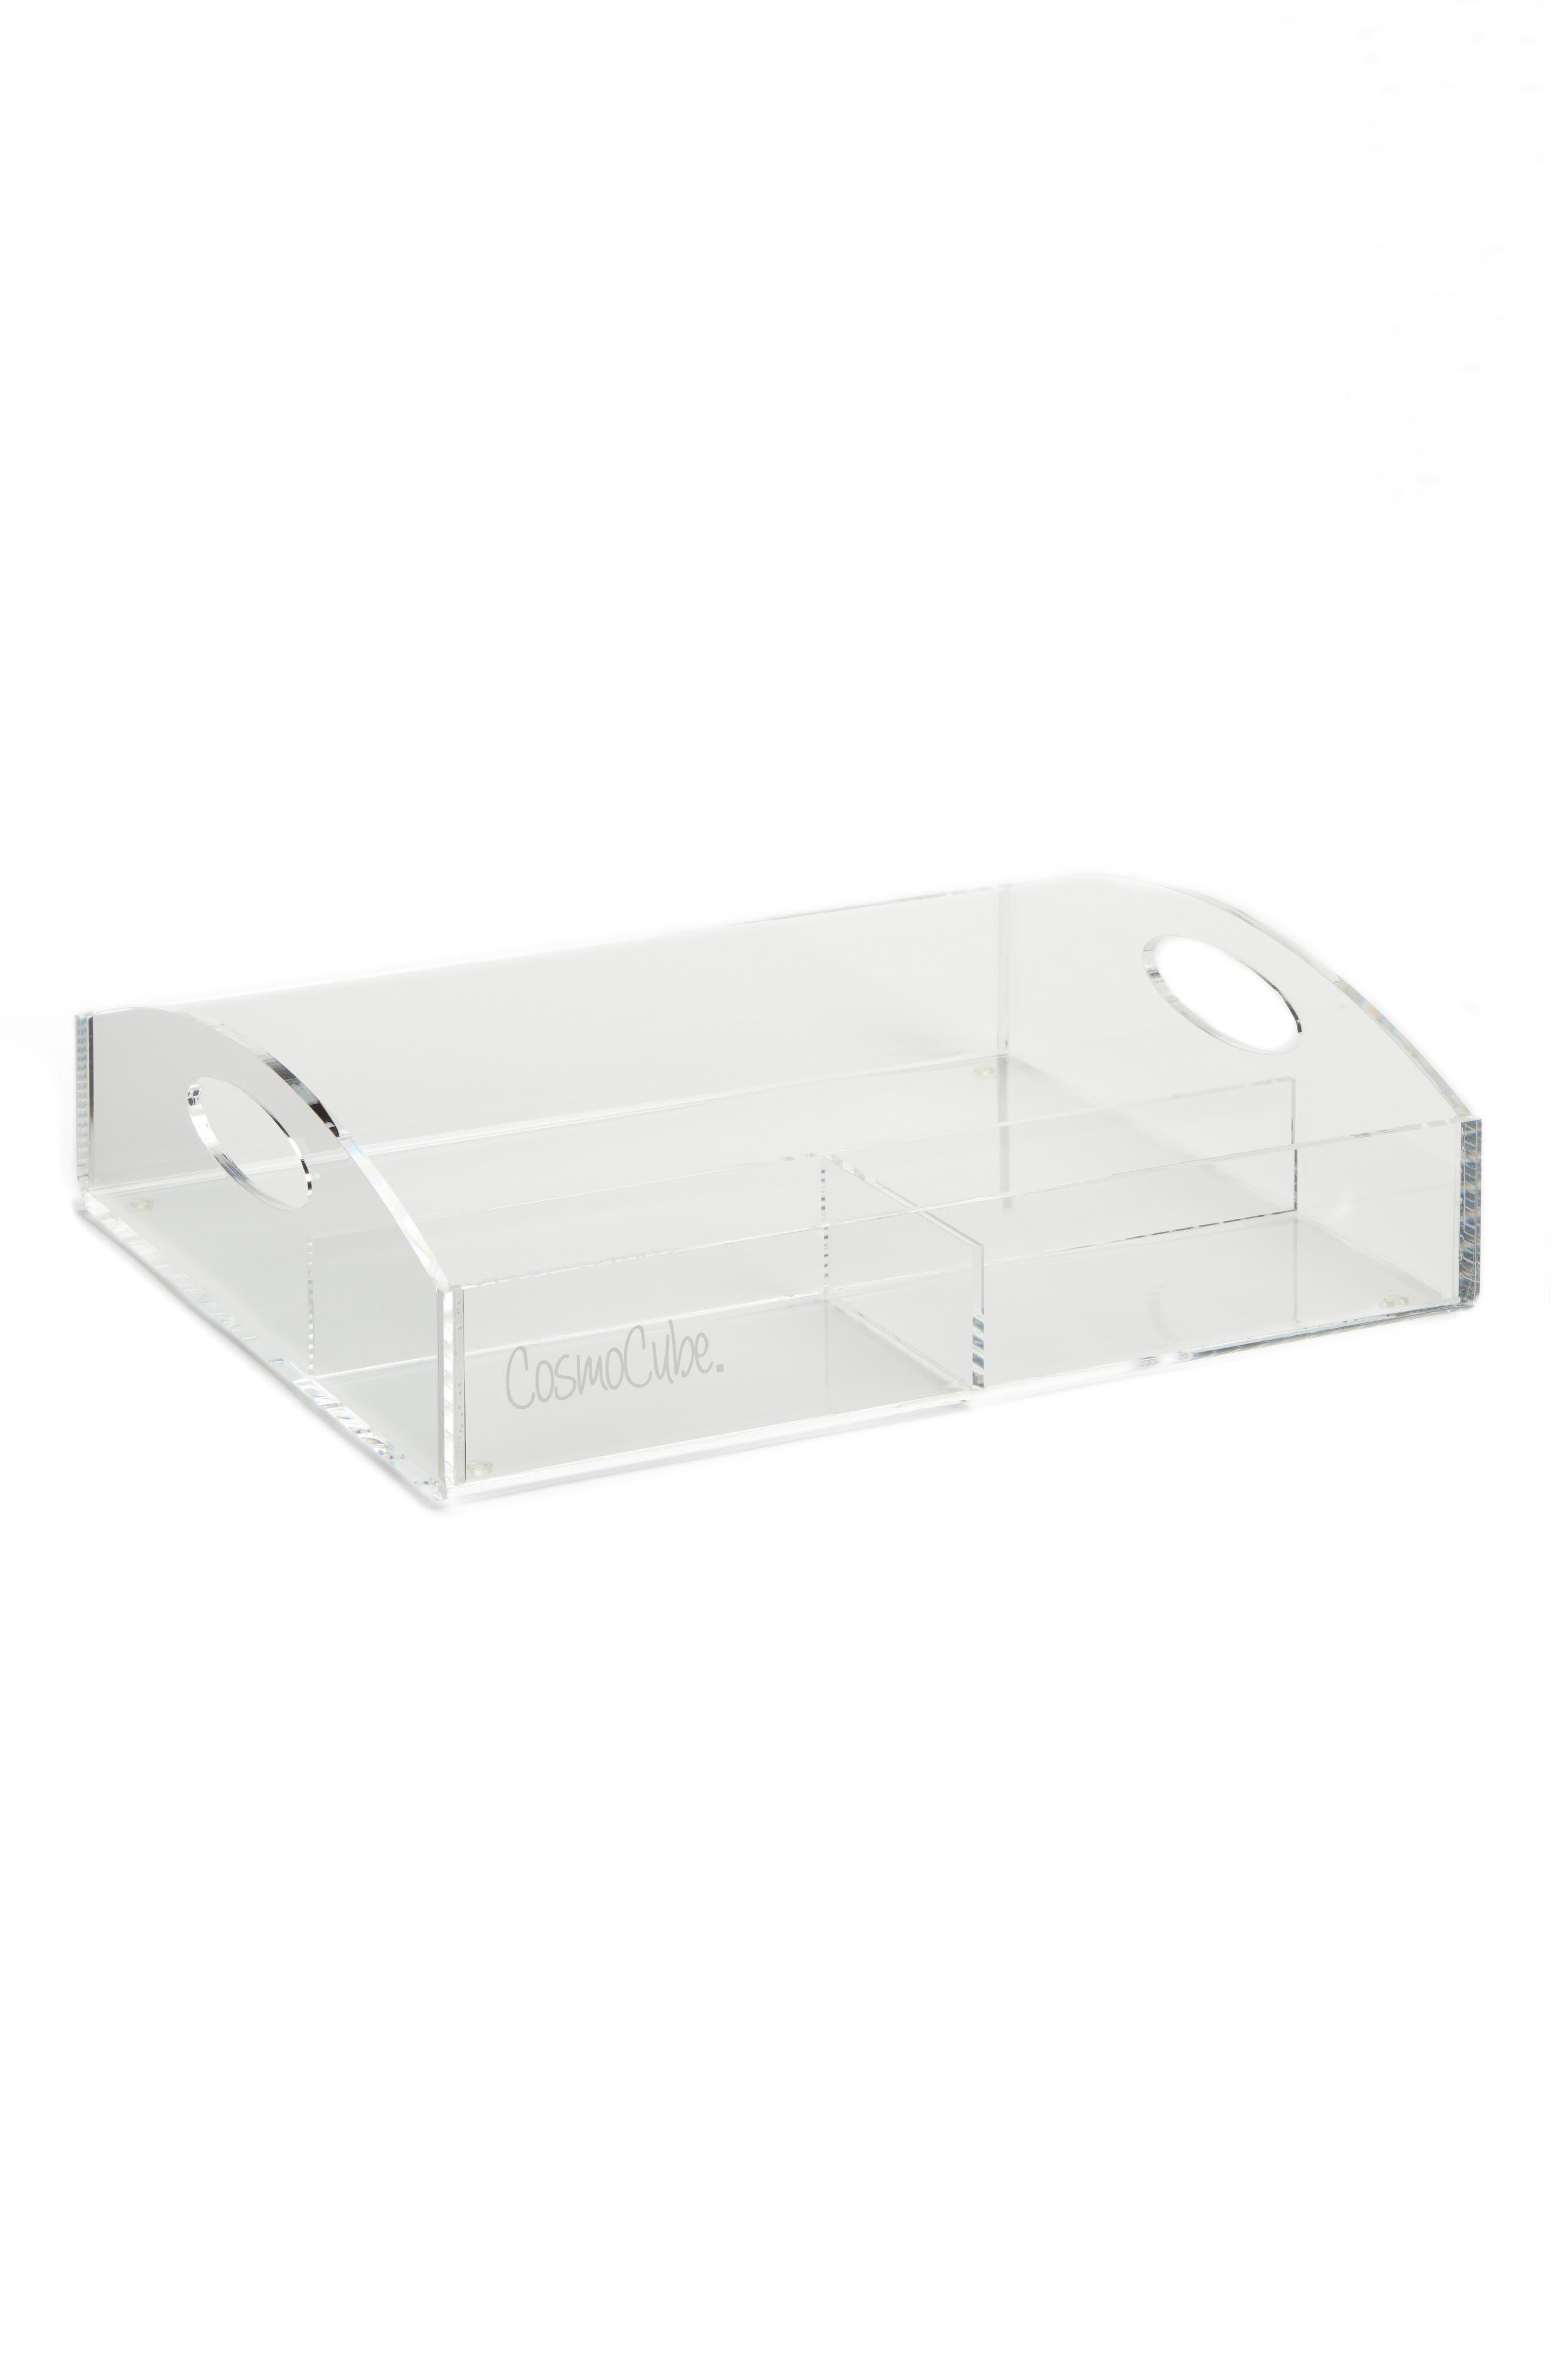 Main Image - CosmoCube® Vanity Tray